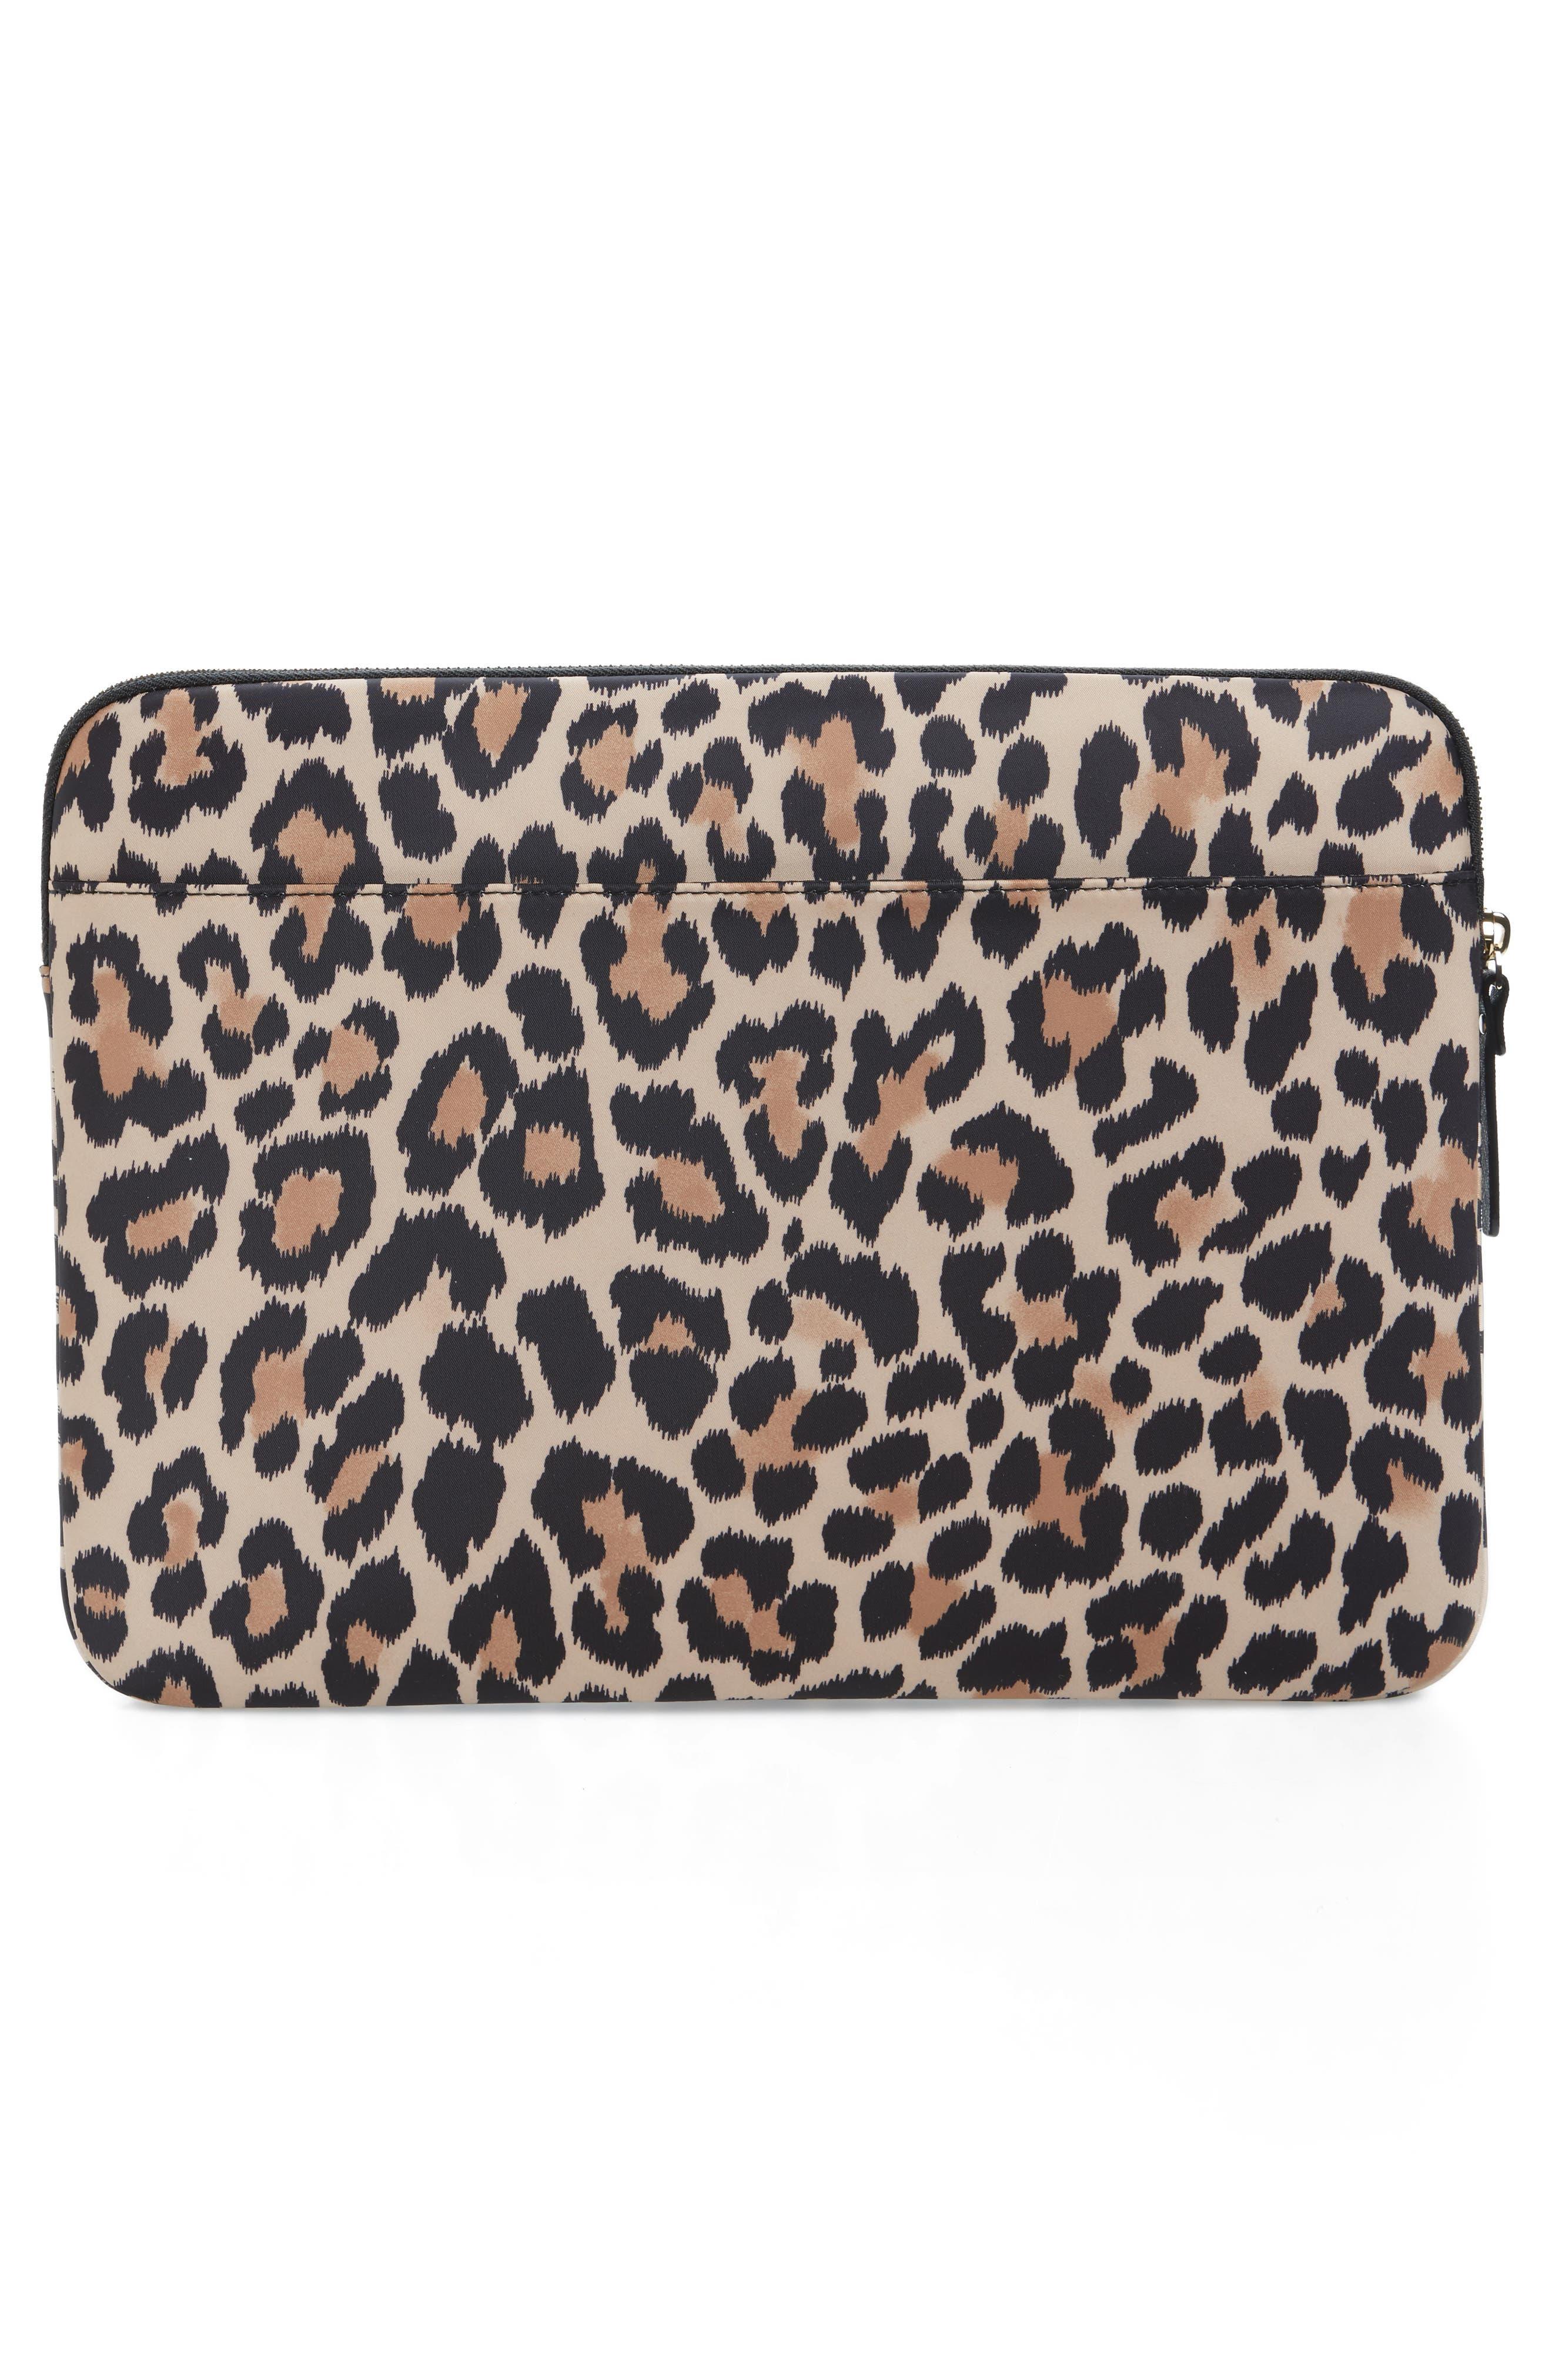 leopard 13-Inch laptop sleeve,                             Alternate thumbnail 4, color,                             200